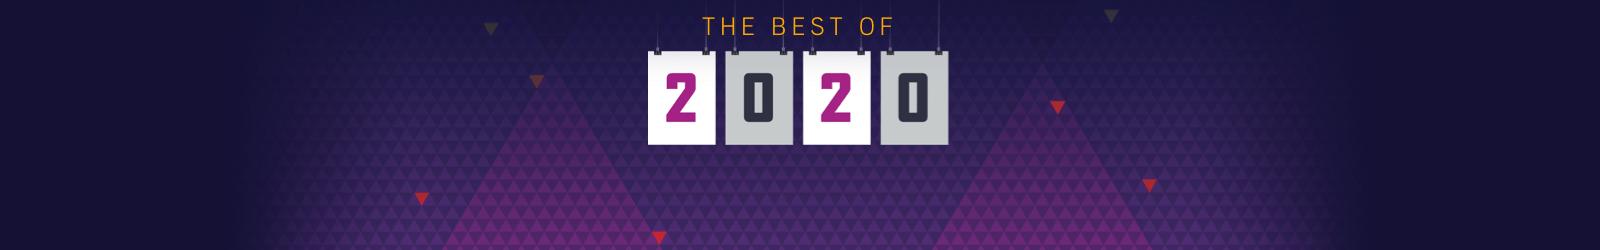 The best audiobooks of 2020